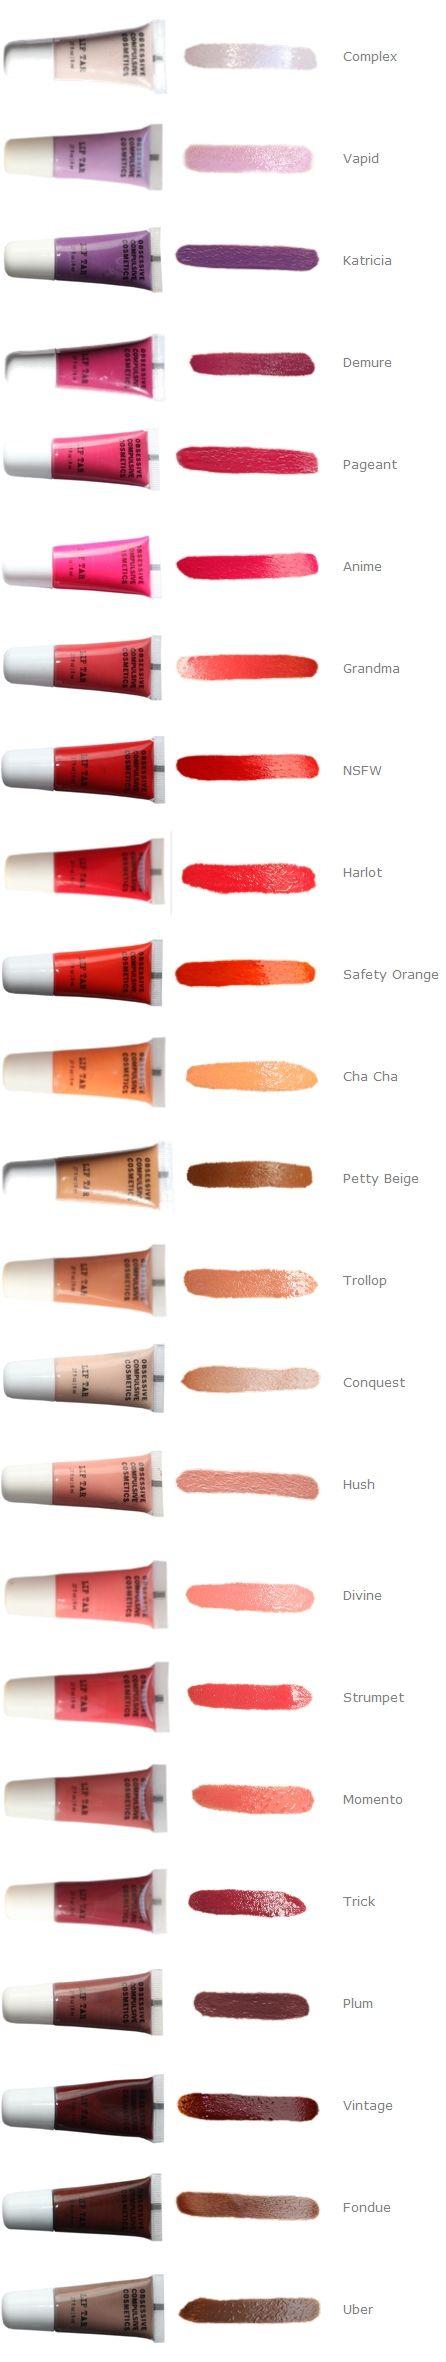 OCC Lip Tar Colour Swatch